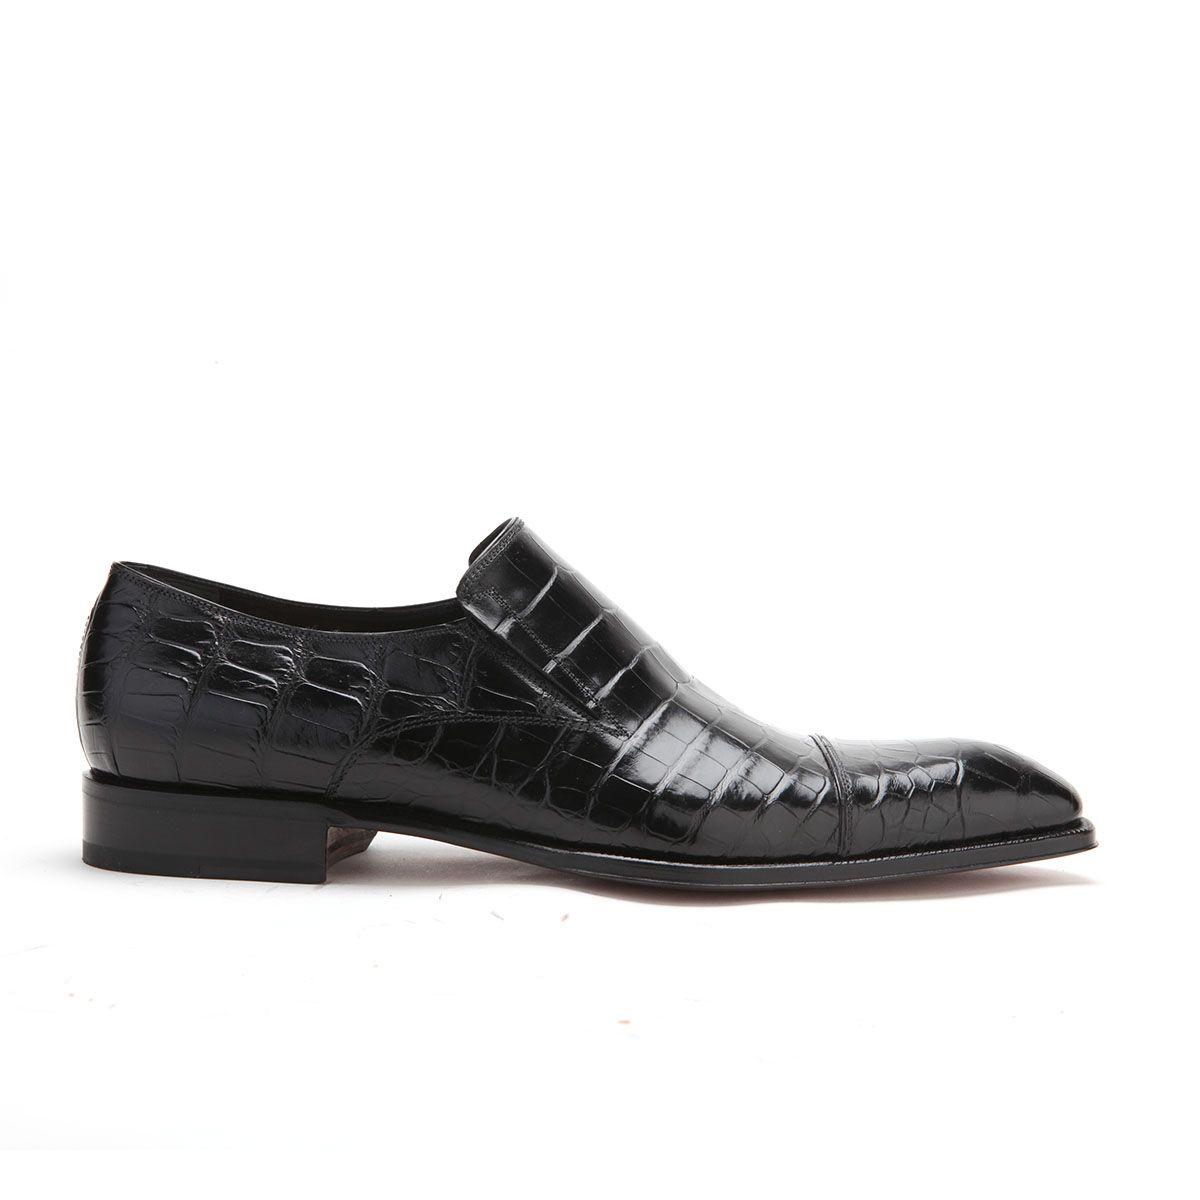 Caporicci Italian Mens Shoes Black